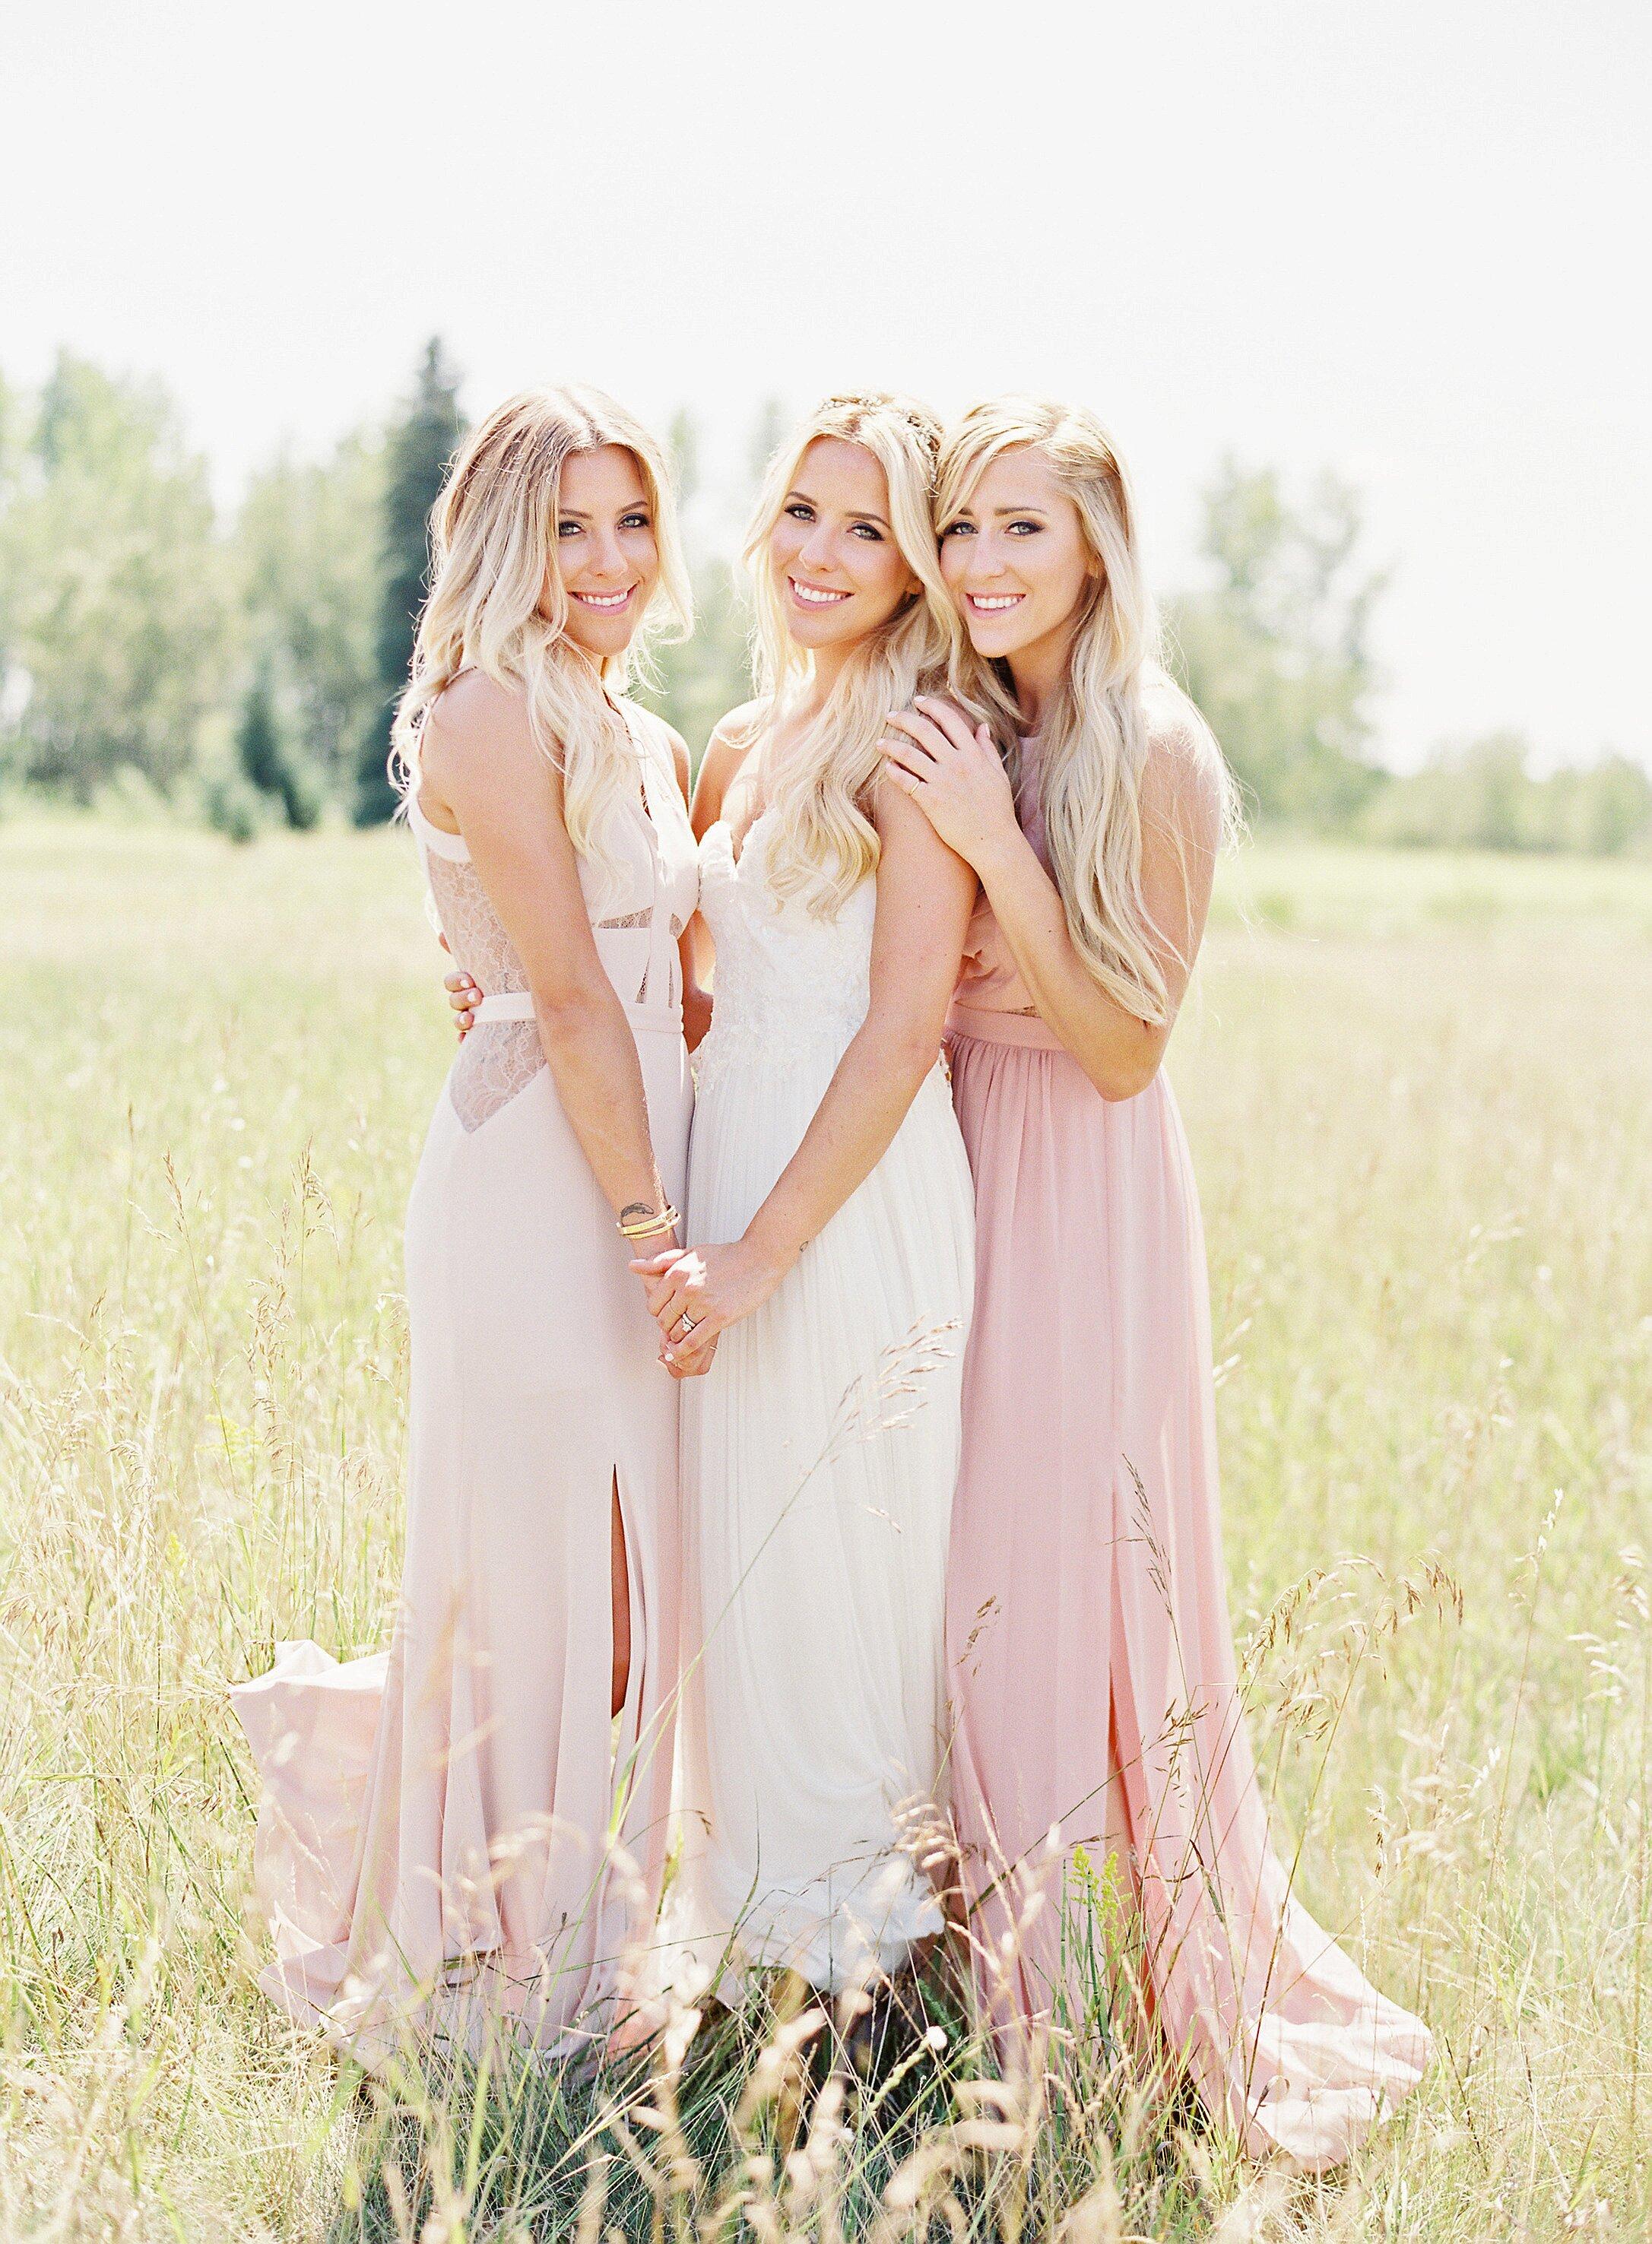 The Coolest Silk Bridesmaids Dresses